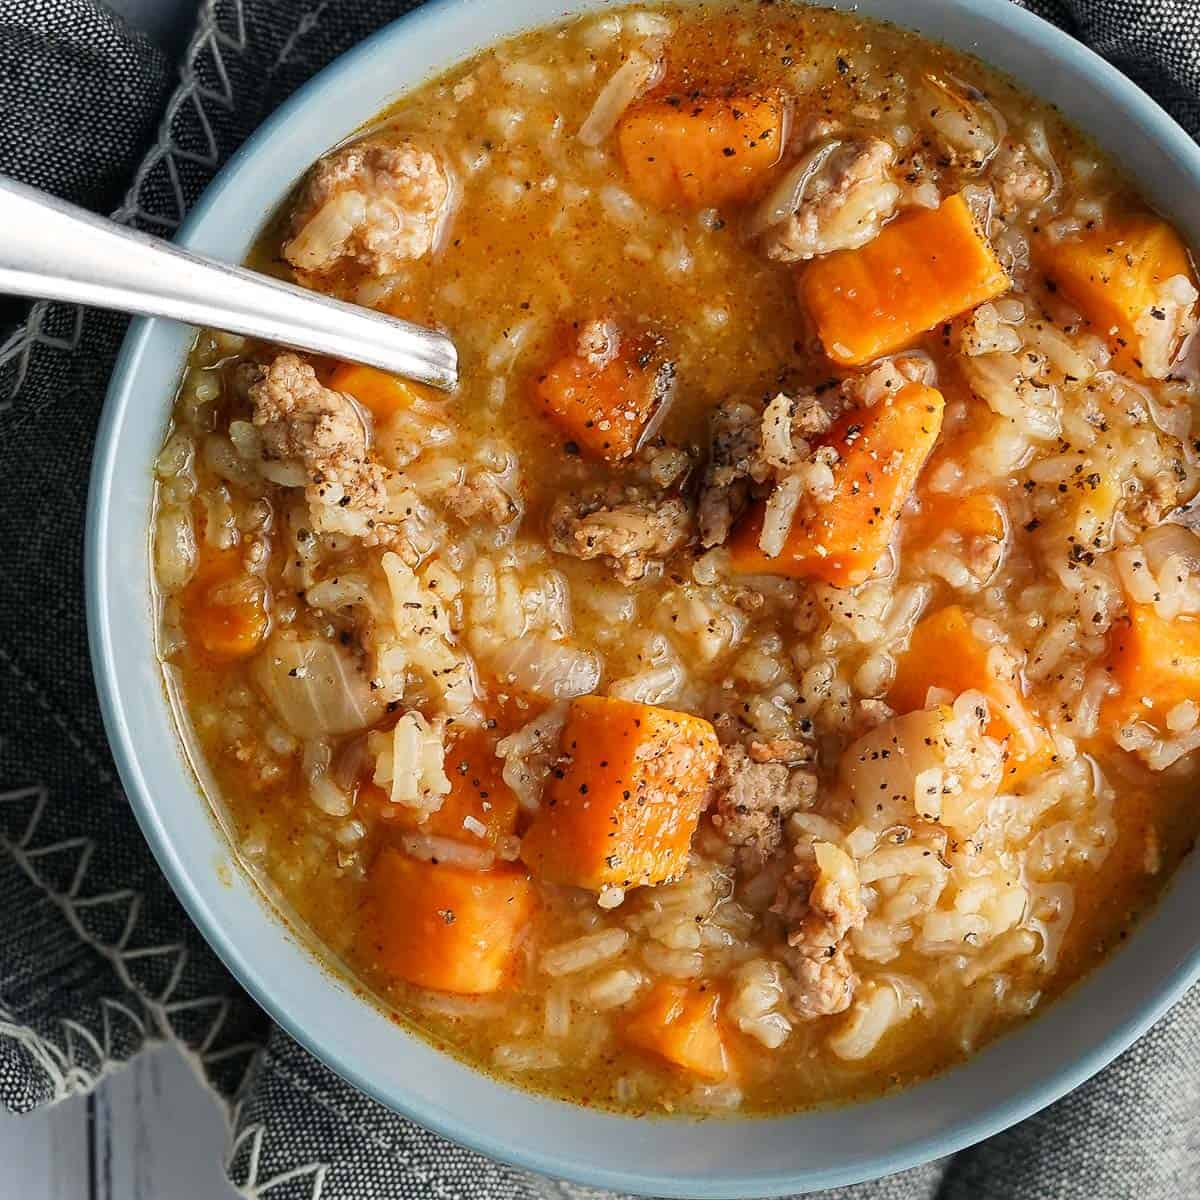 Turkey Sweet Potato Soup in blue bowl with spoon